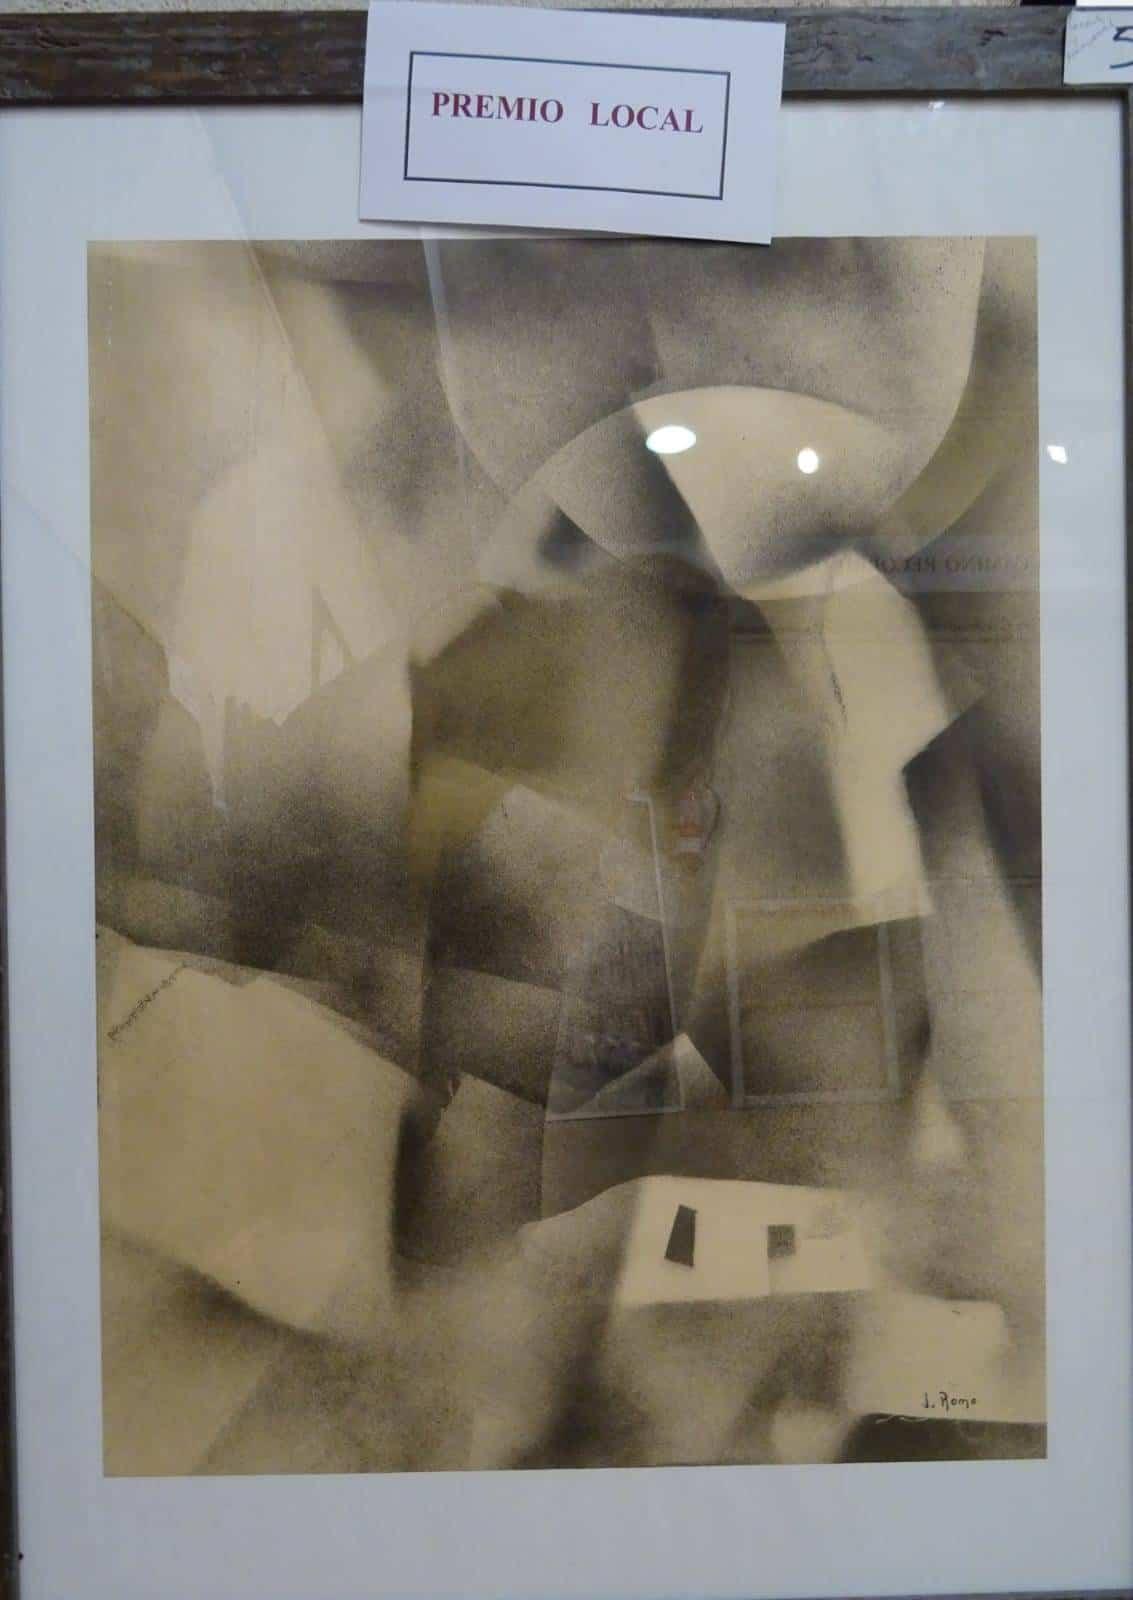 "premio local XXXVI Concurso Nacional de Pintura - Obras premiadas en el XXXVI Concurso Nacional de Pintura ""Jesús Madero"""